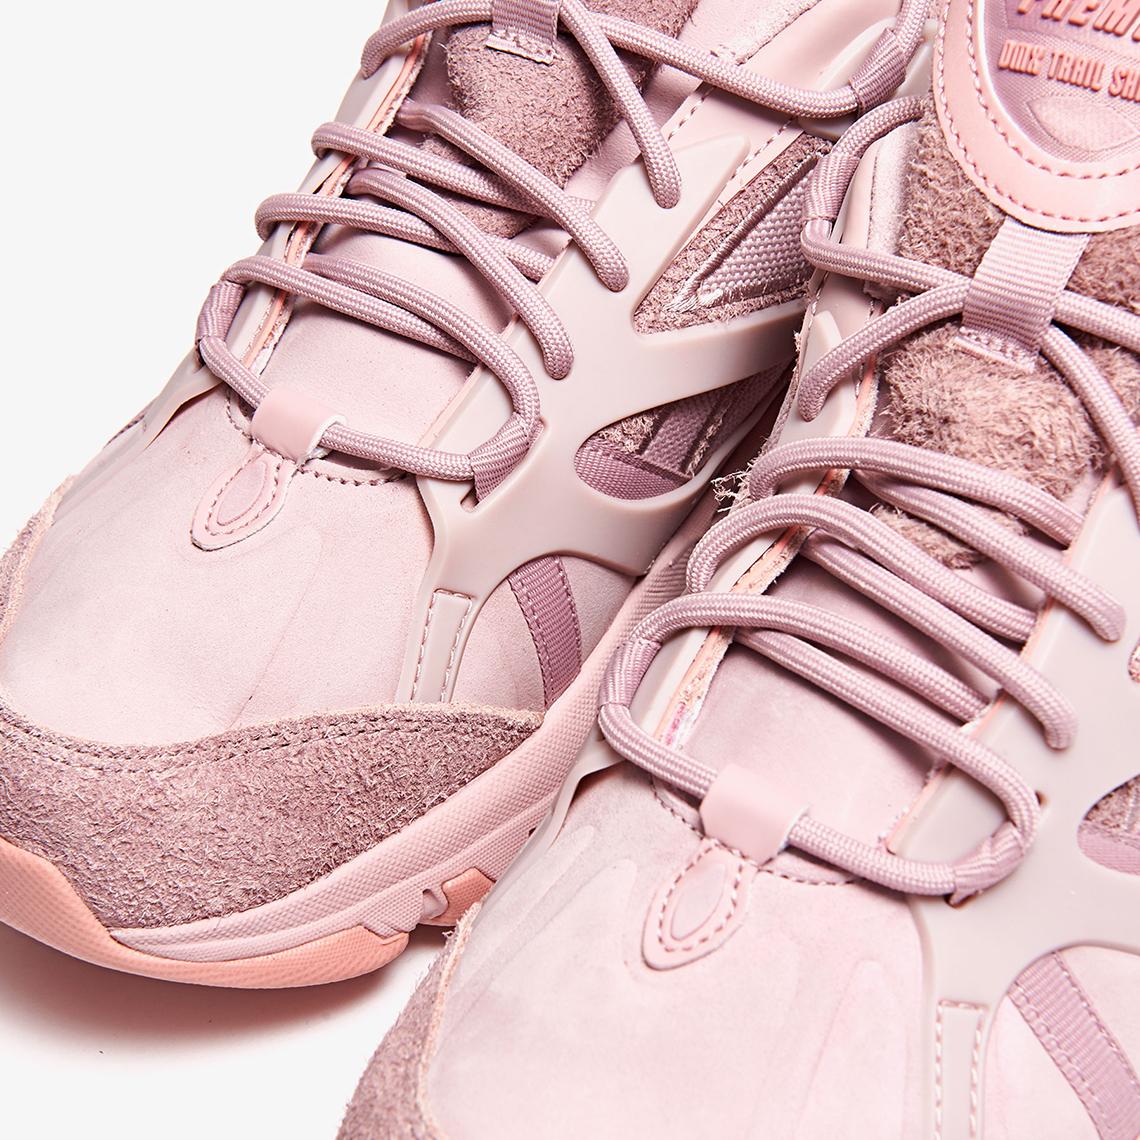 Reebok-DMX-Trail-Shadow-Pink- laces